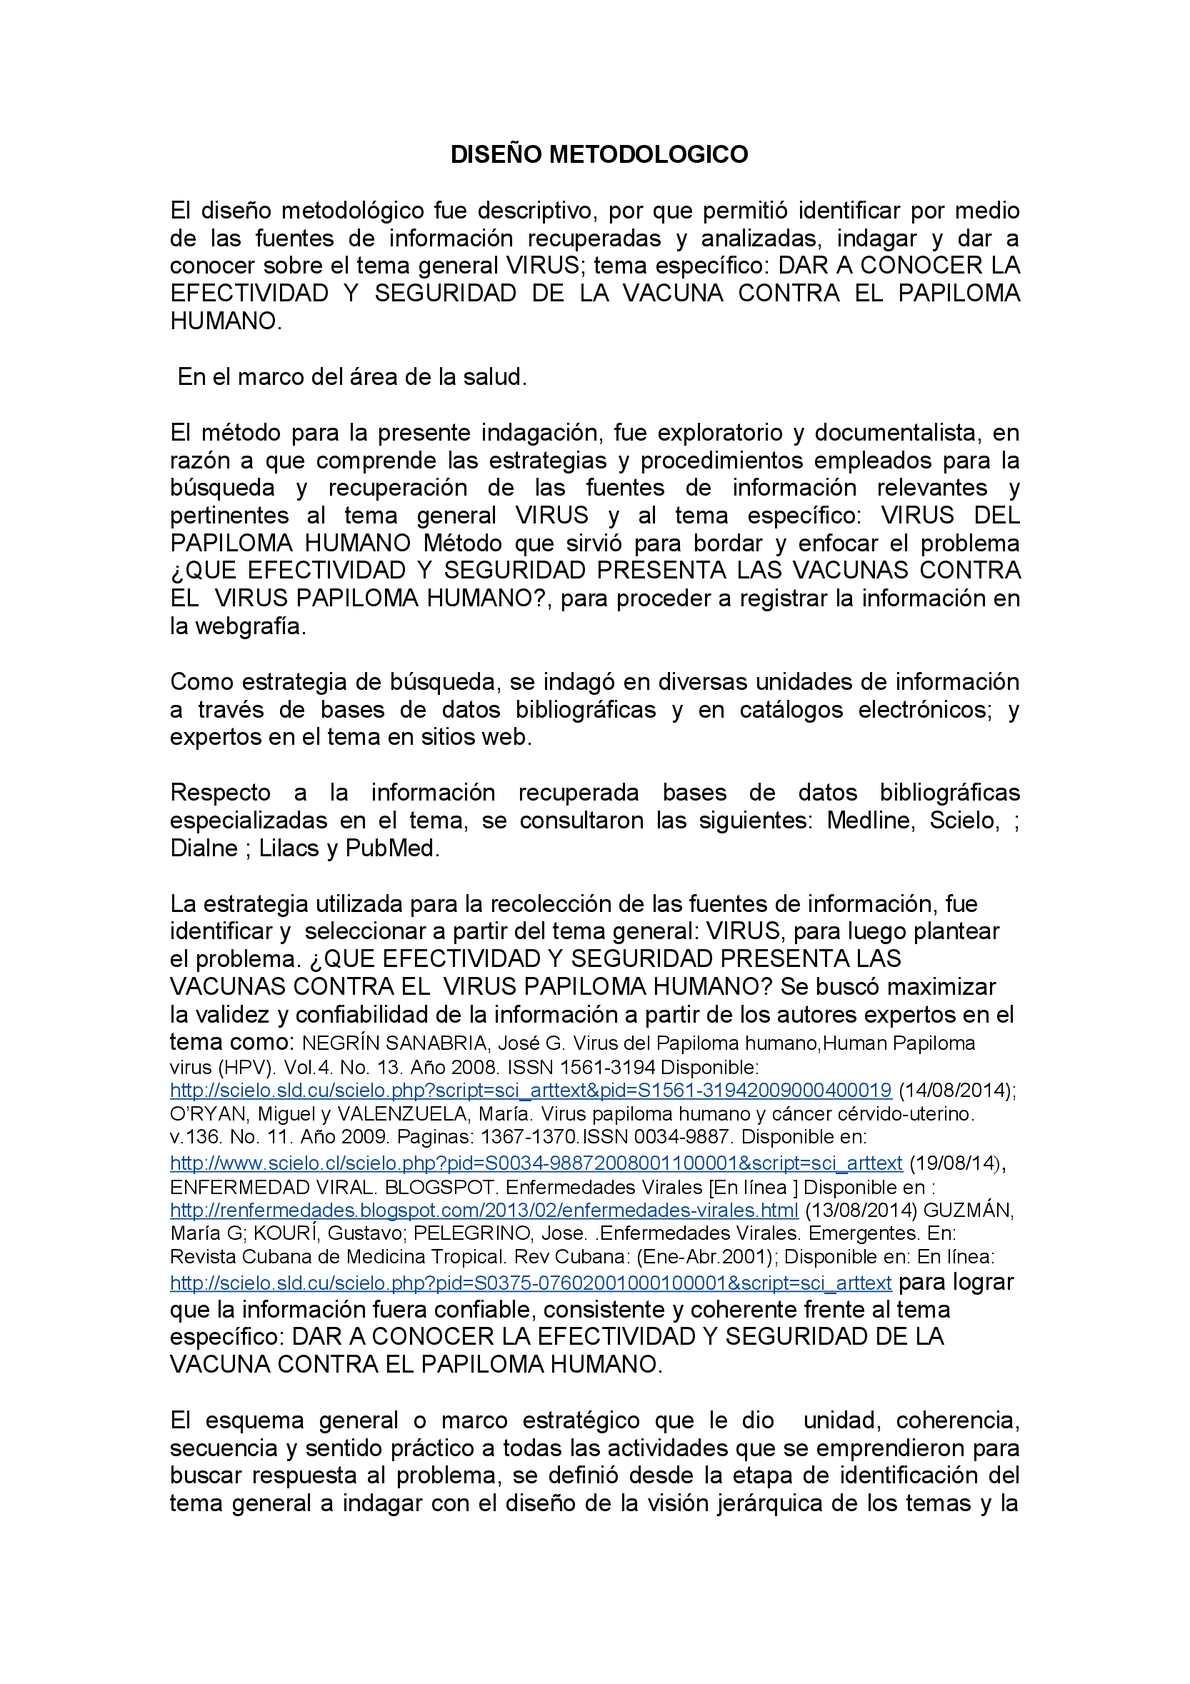 virus papiloma humano medline human papillomavirus mode of transmission